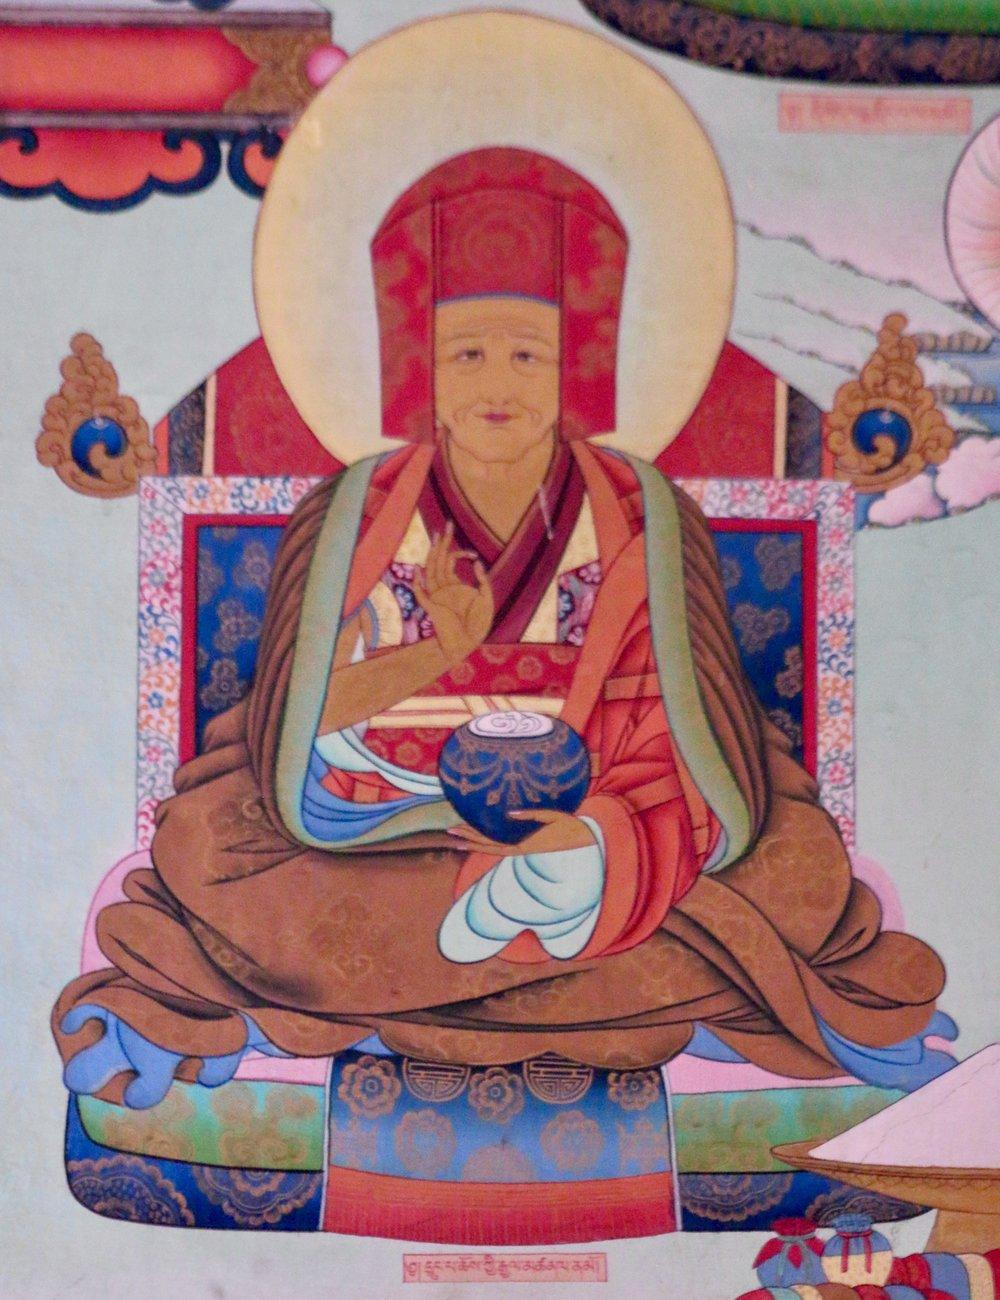 ✔️ 10th Trungpa Chokyi Gyaltsen